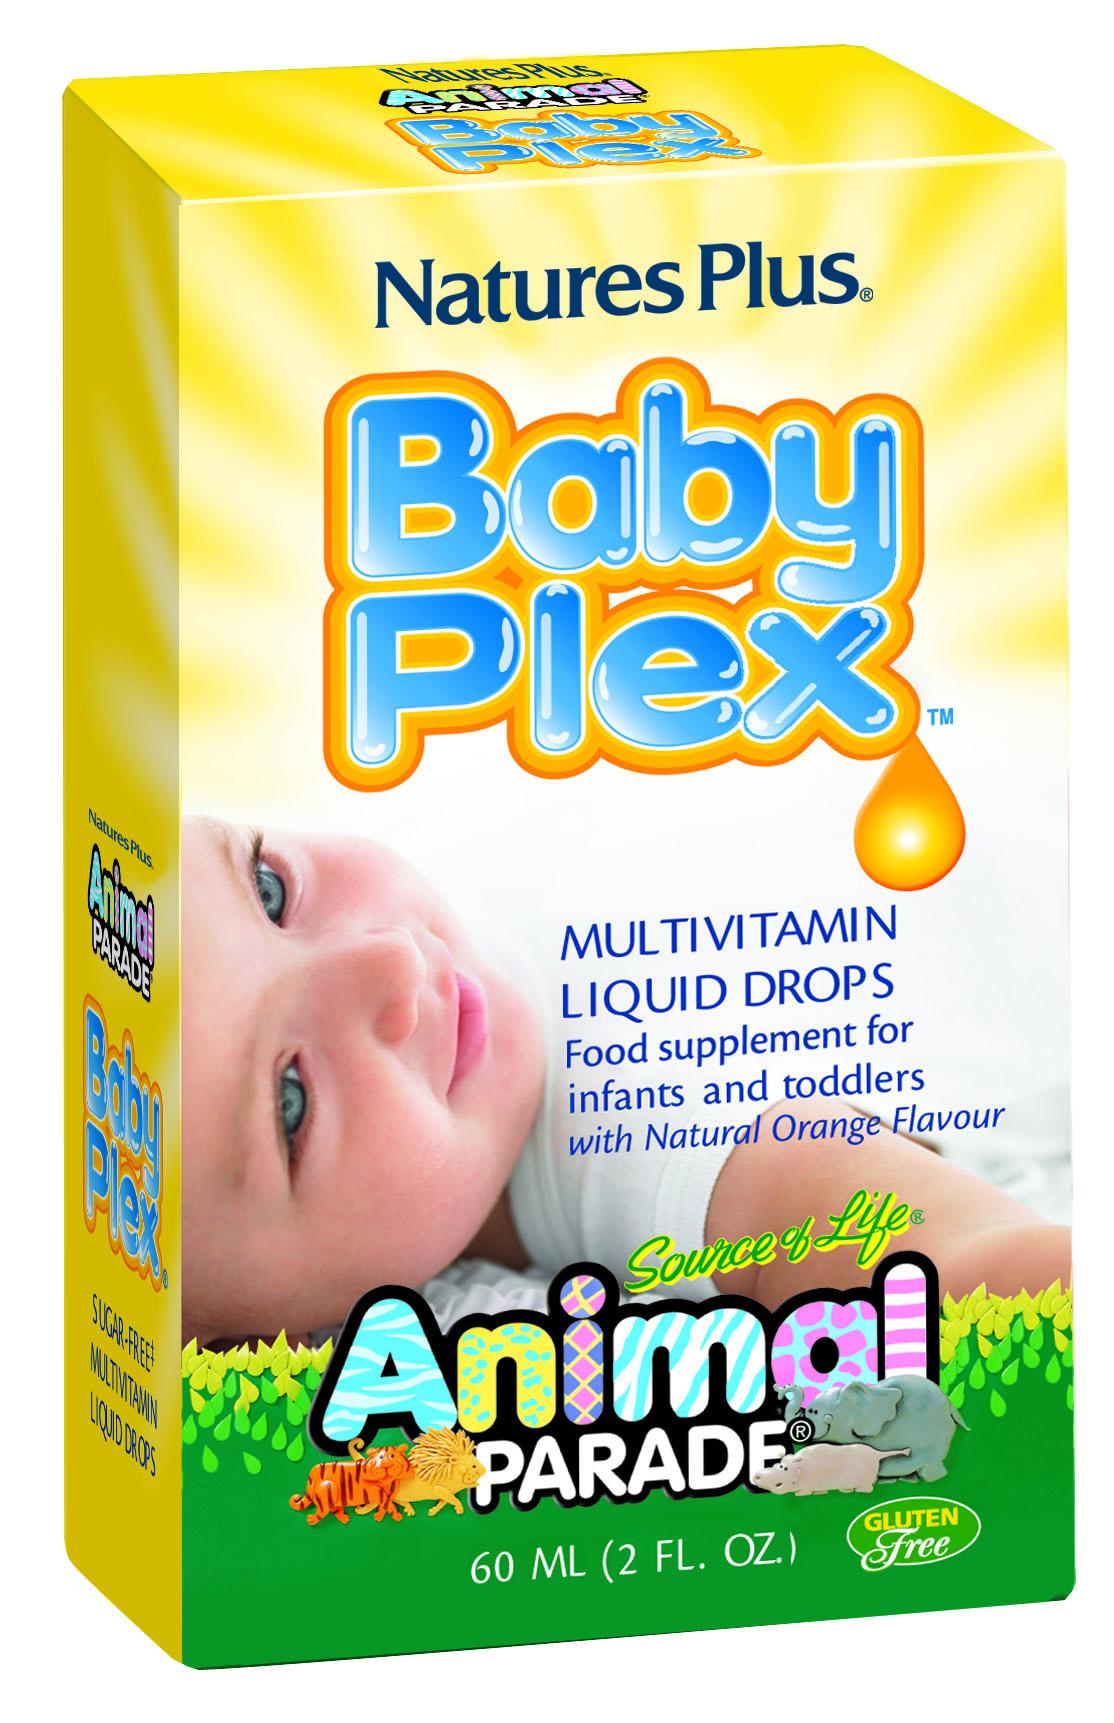 Baby Plex (Source of Life Animal Parade) 60ml